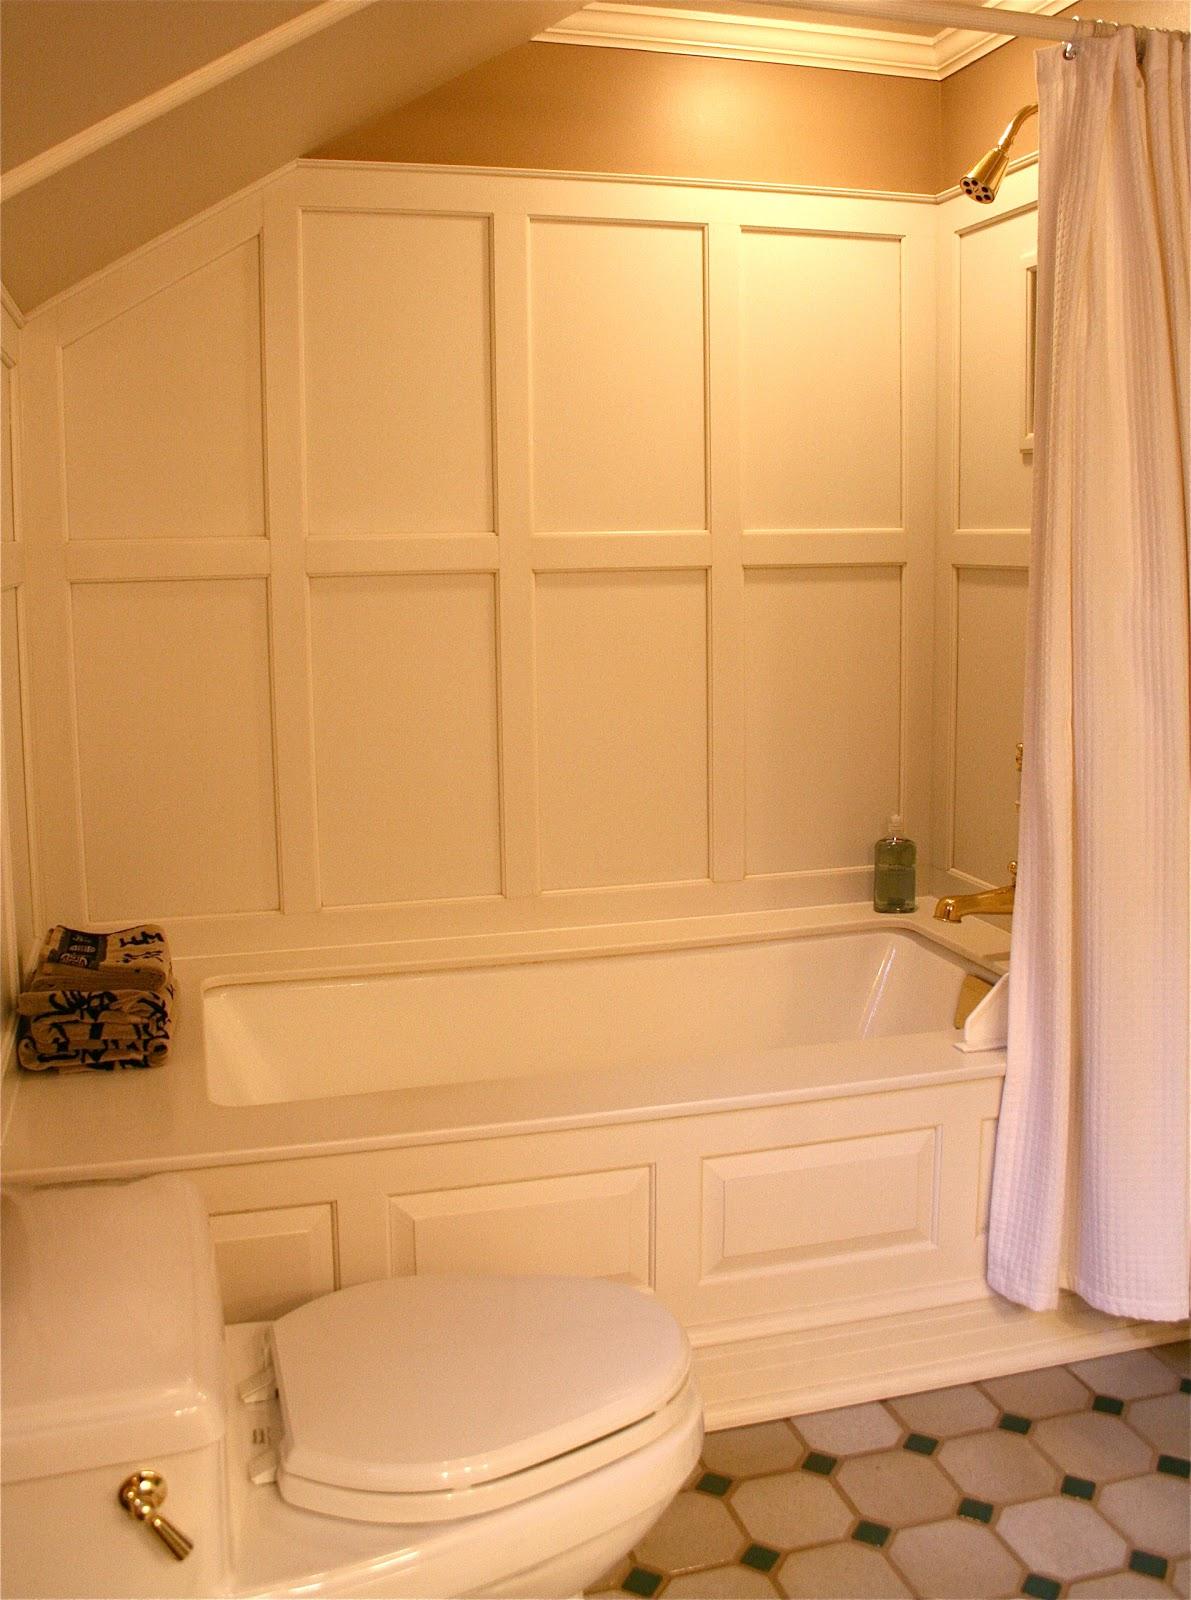 Home Depot Bathroom Tiles Ideas Antiqueaholics Bathtub Surround Paneled With Corian